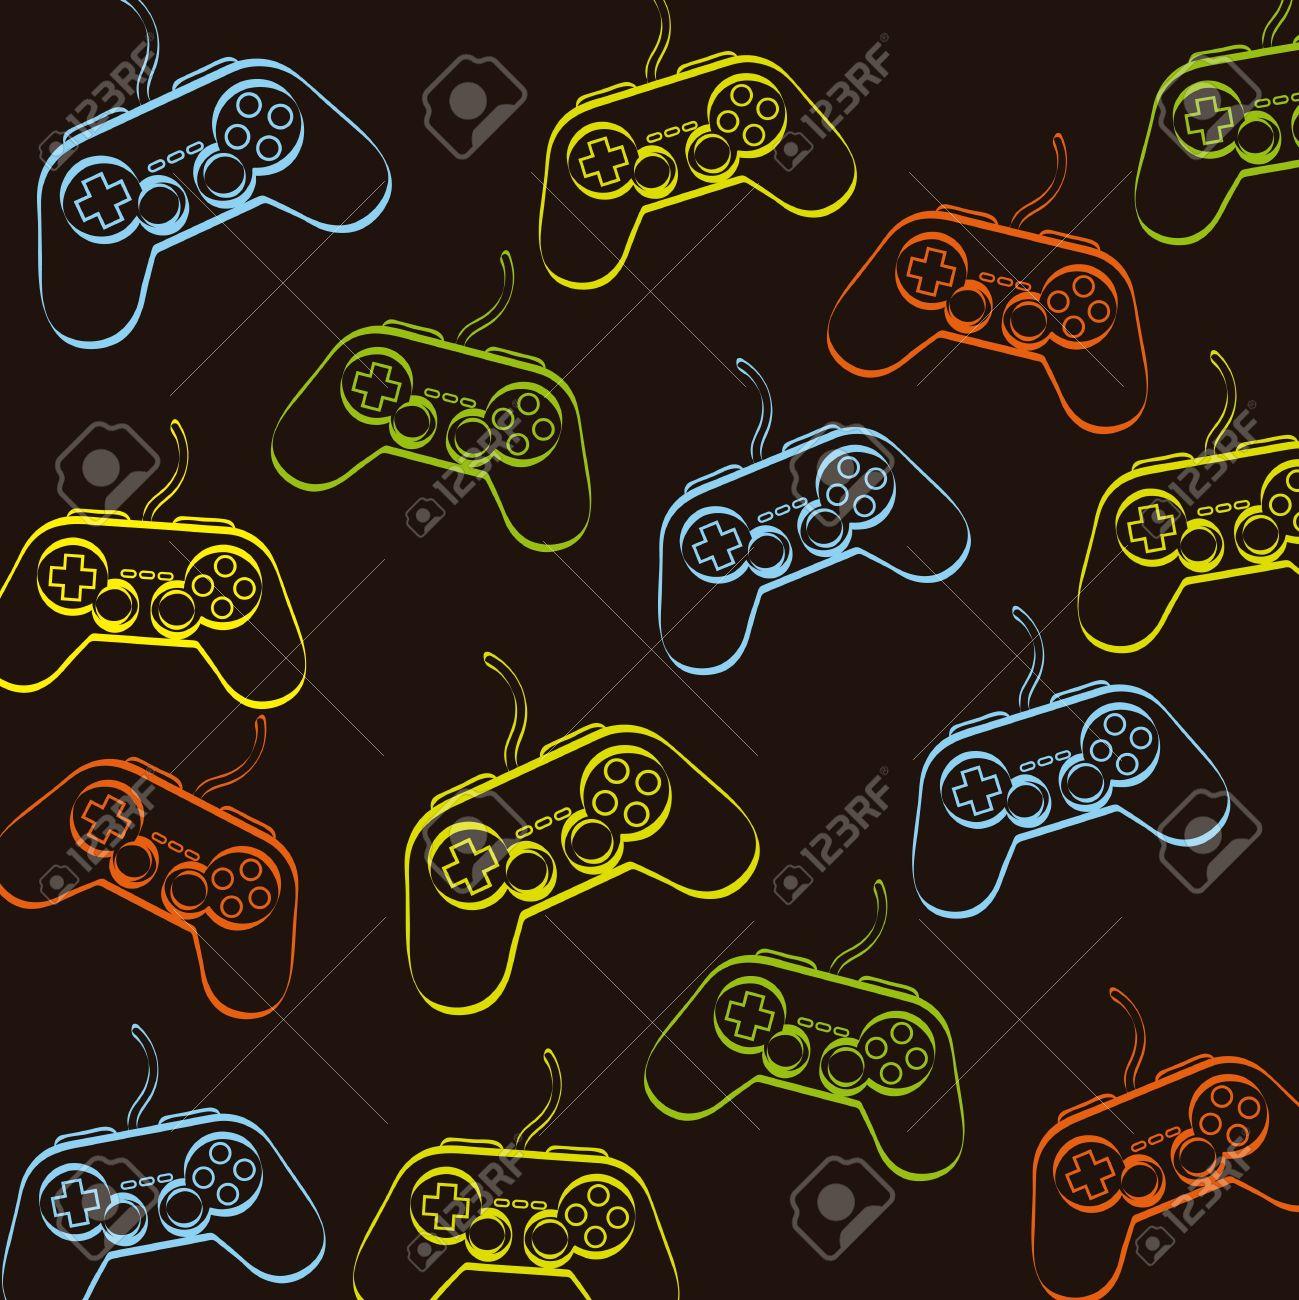 Gamepad Over Black Background Vector Illustration Royalty 1299x1300